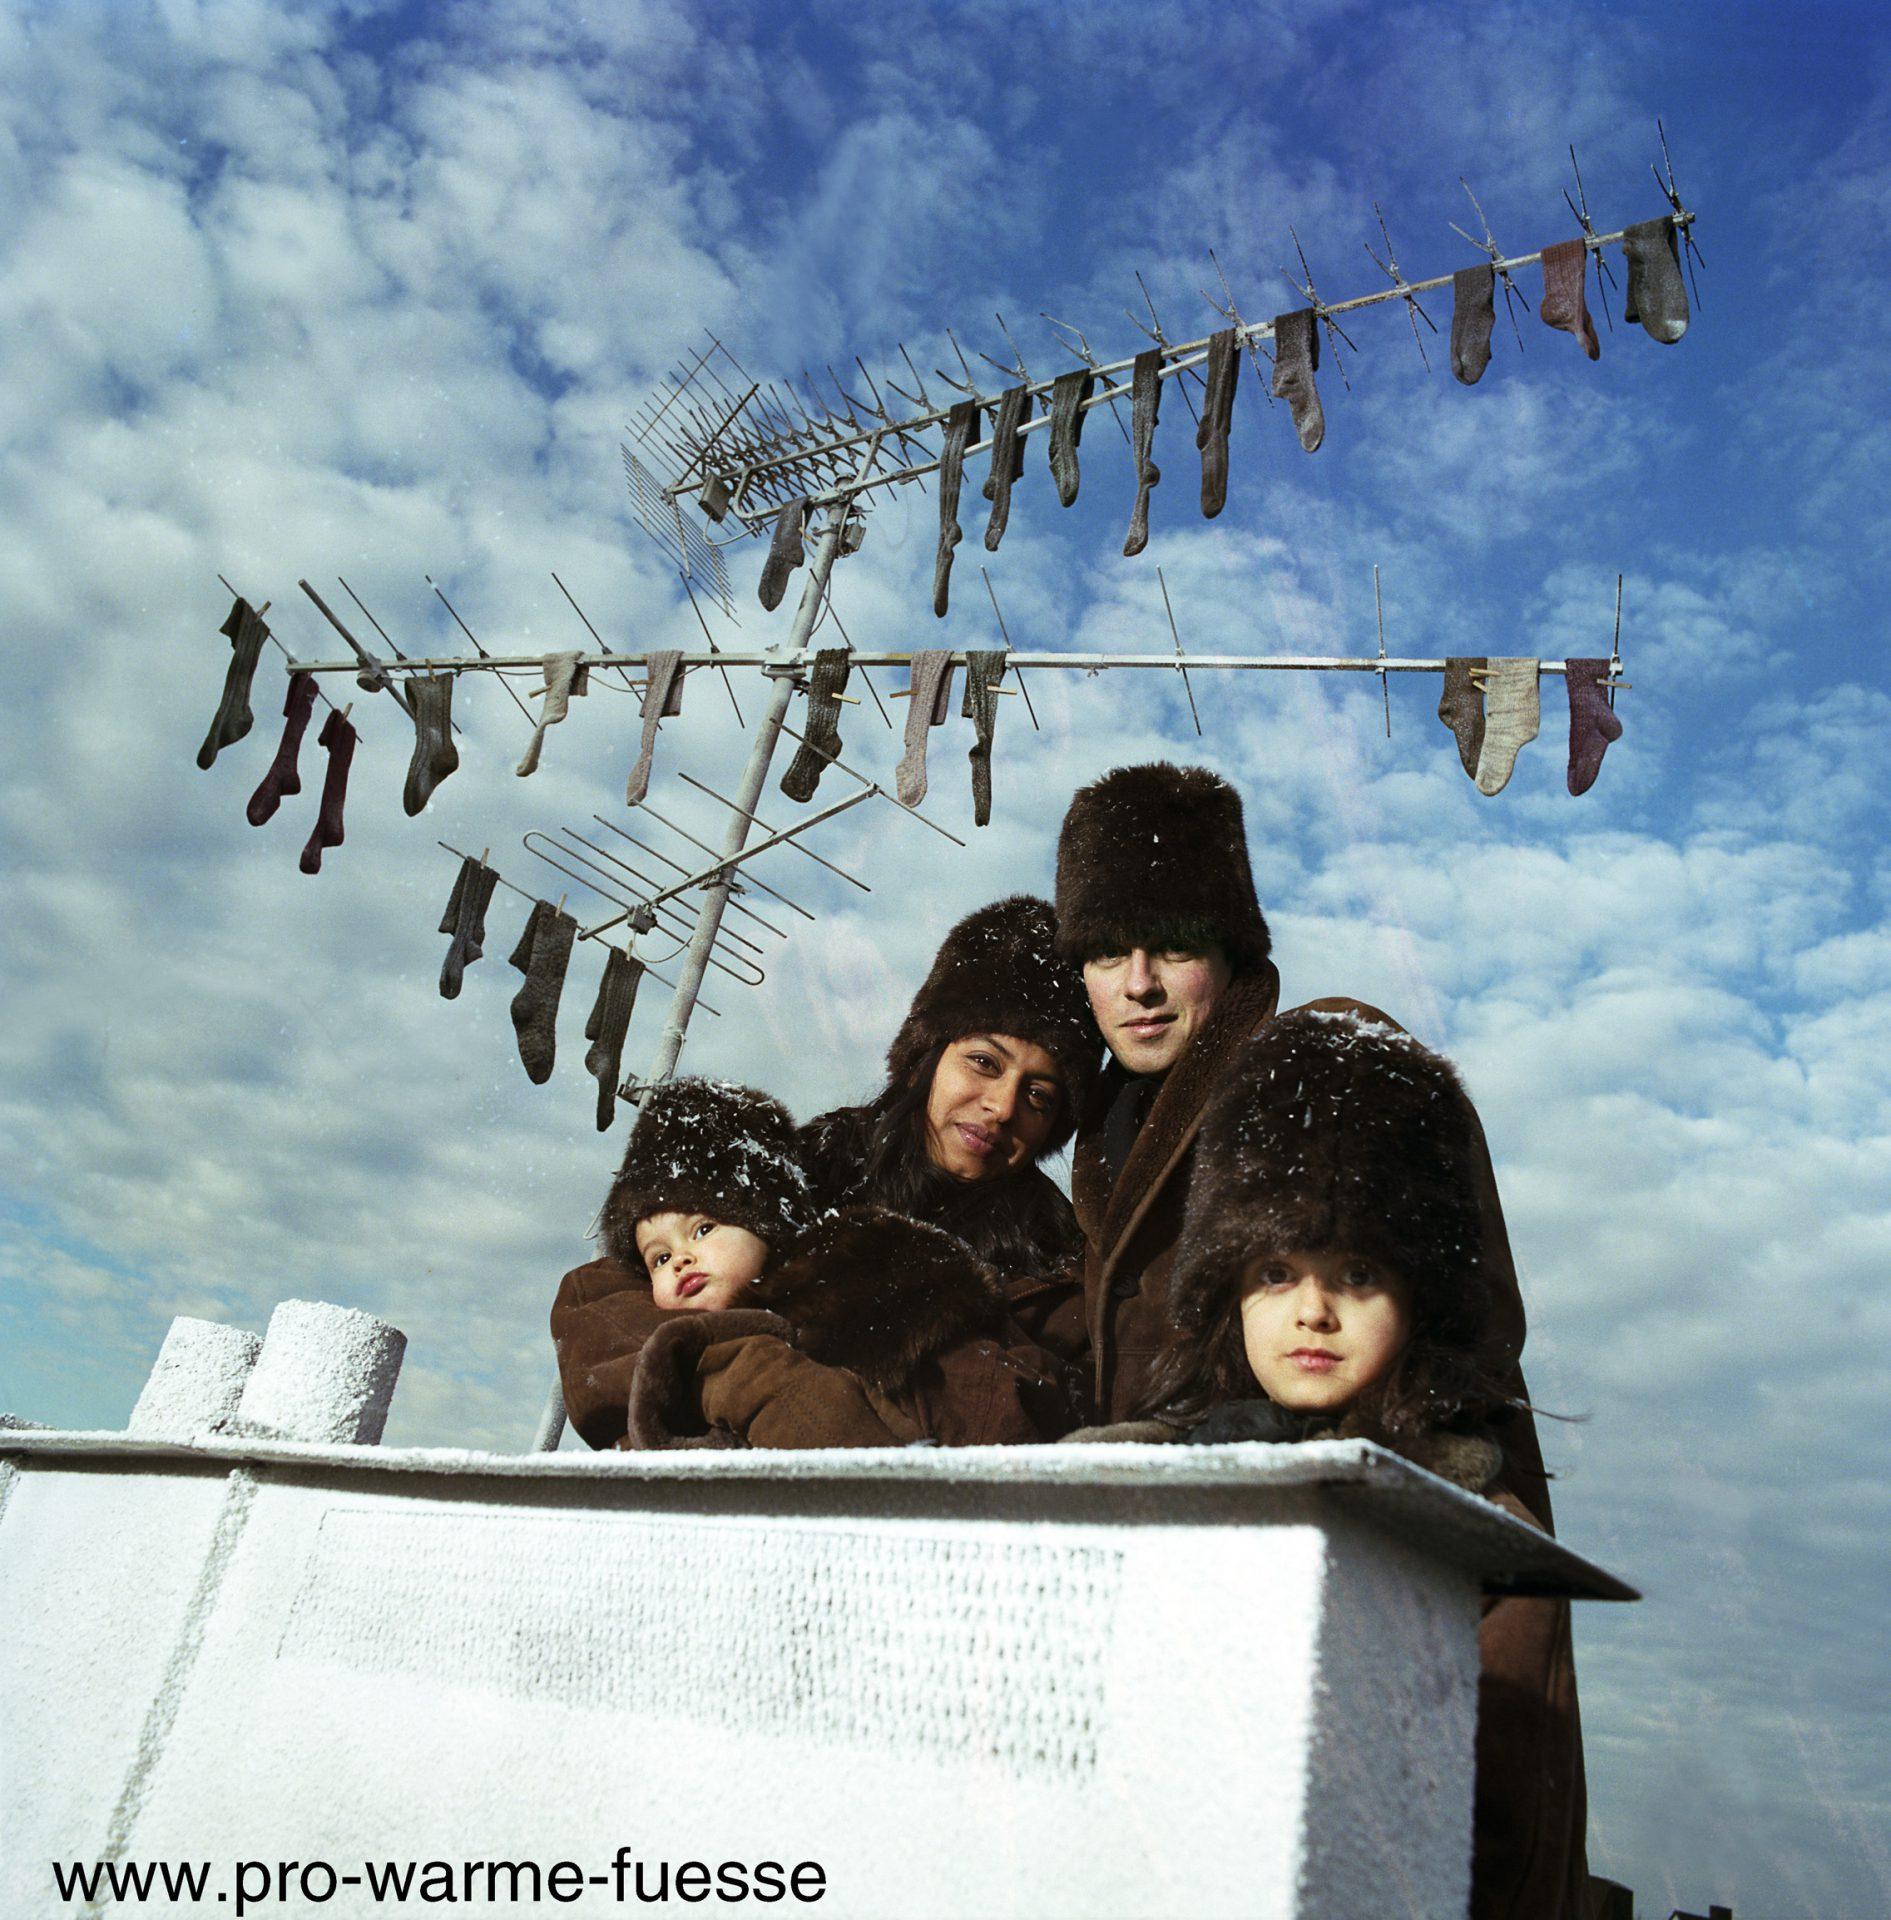 pro-warme-fuesse-03sel.